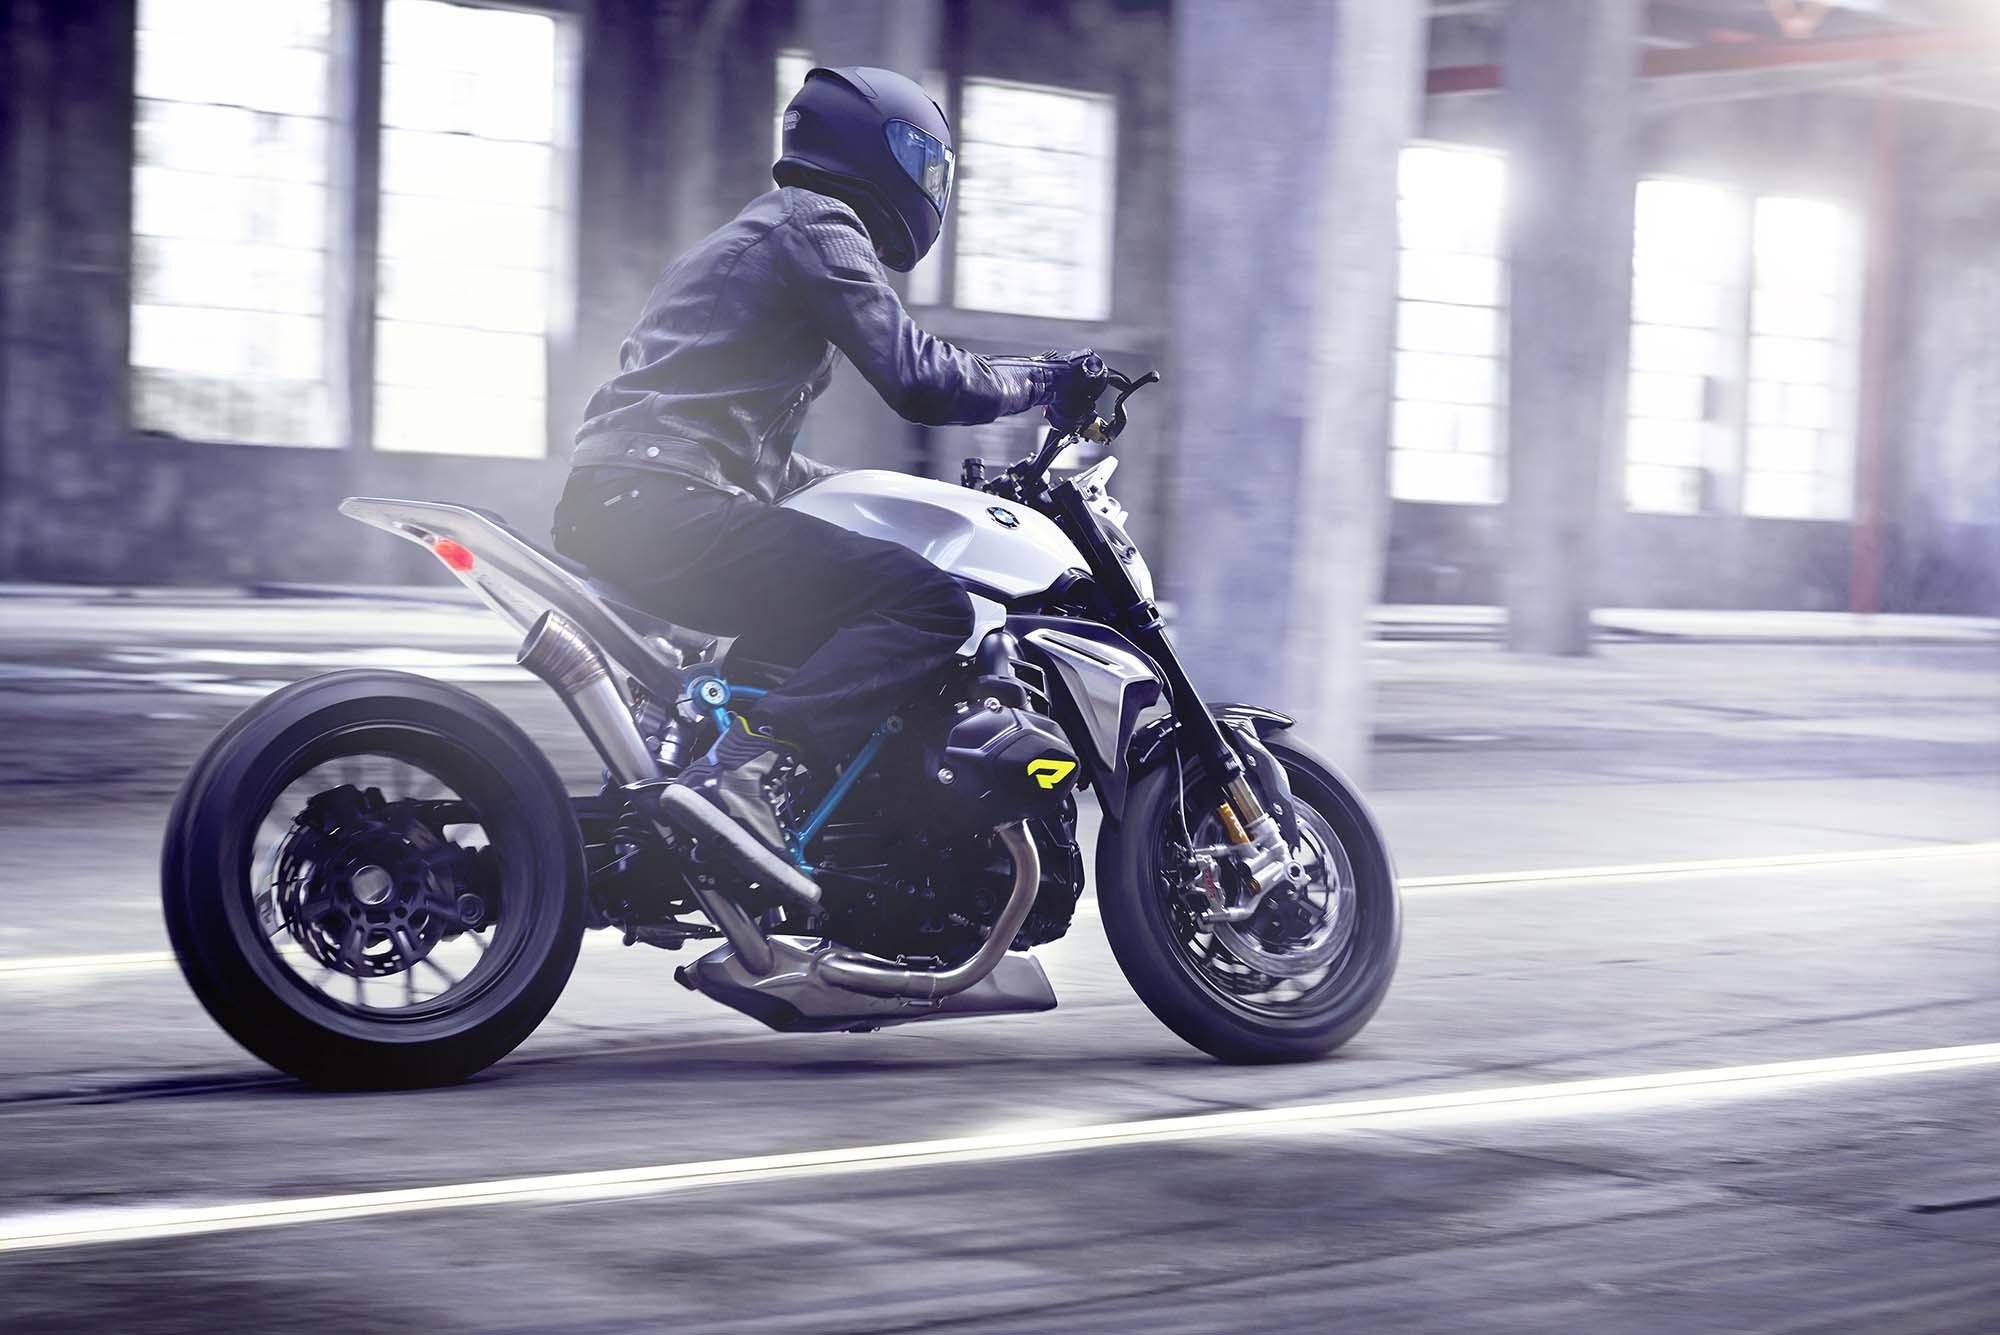 Bmw Concept Roadster Nom De Dieu Asphalt Amp Rubber